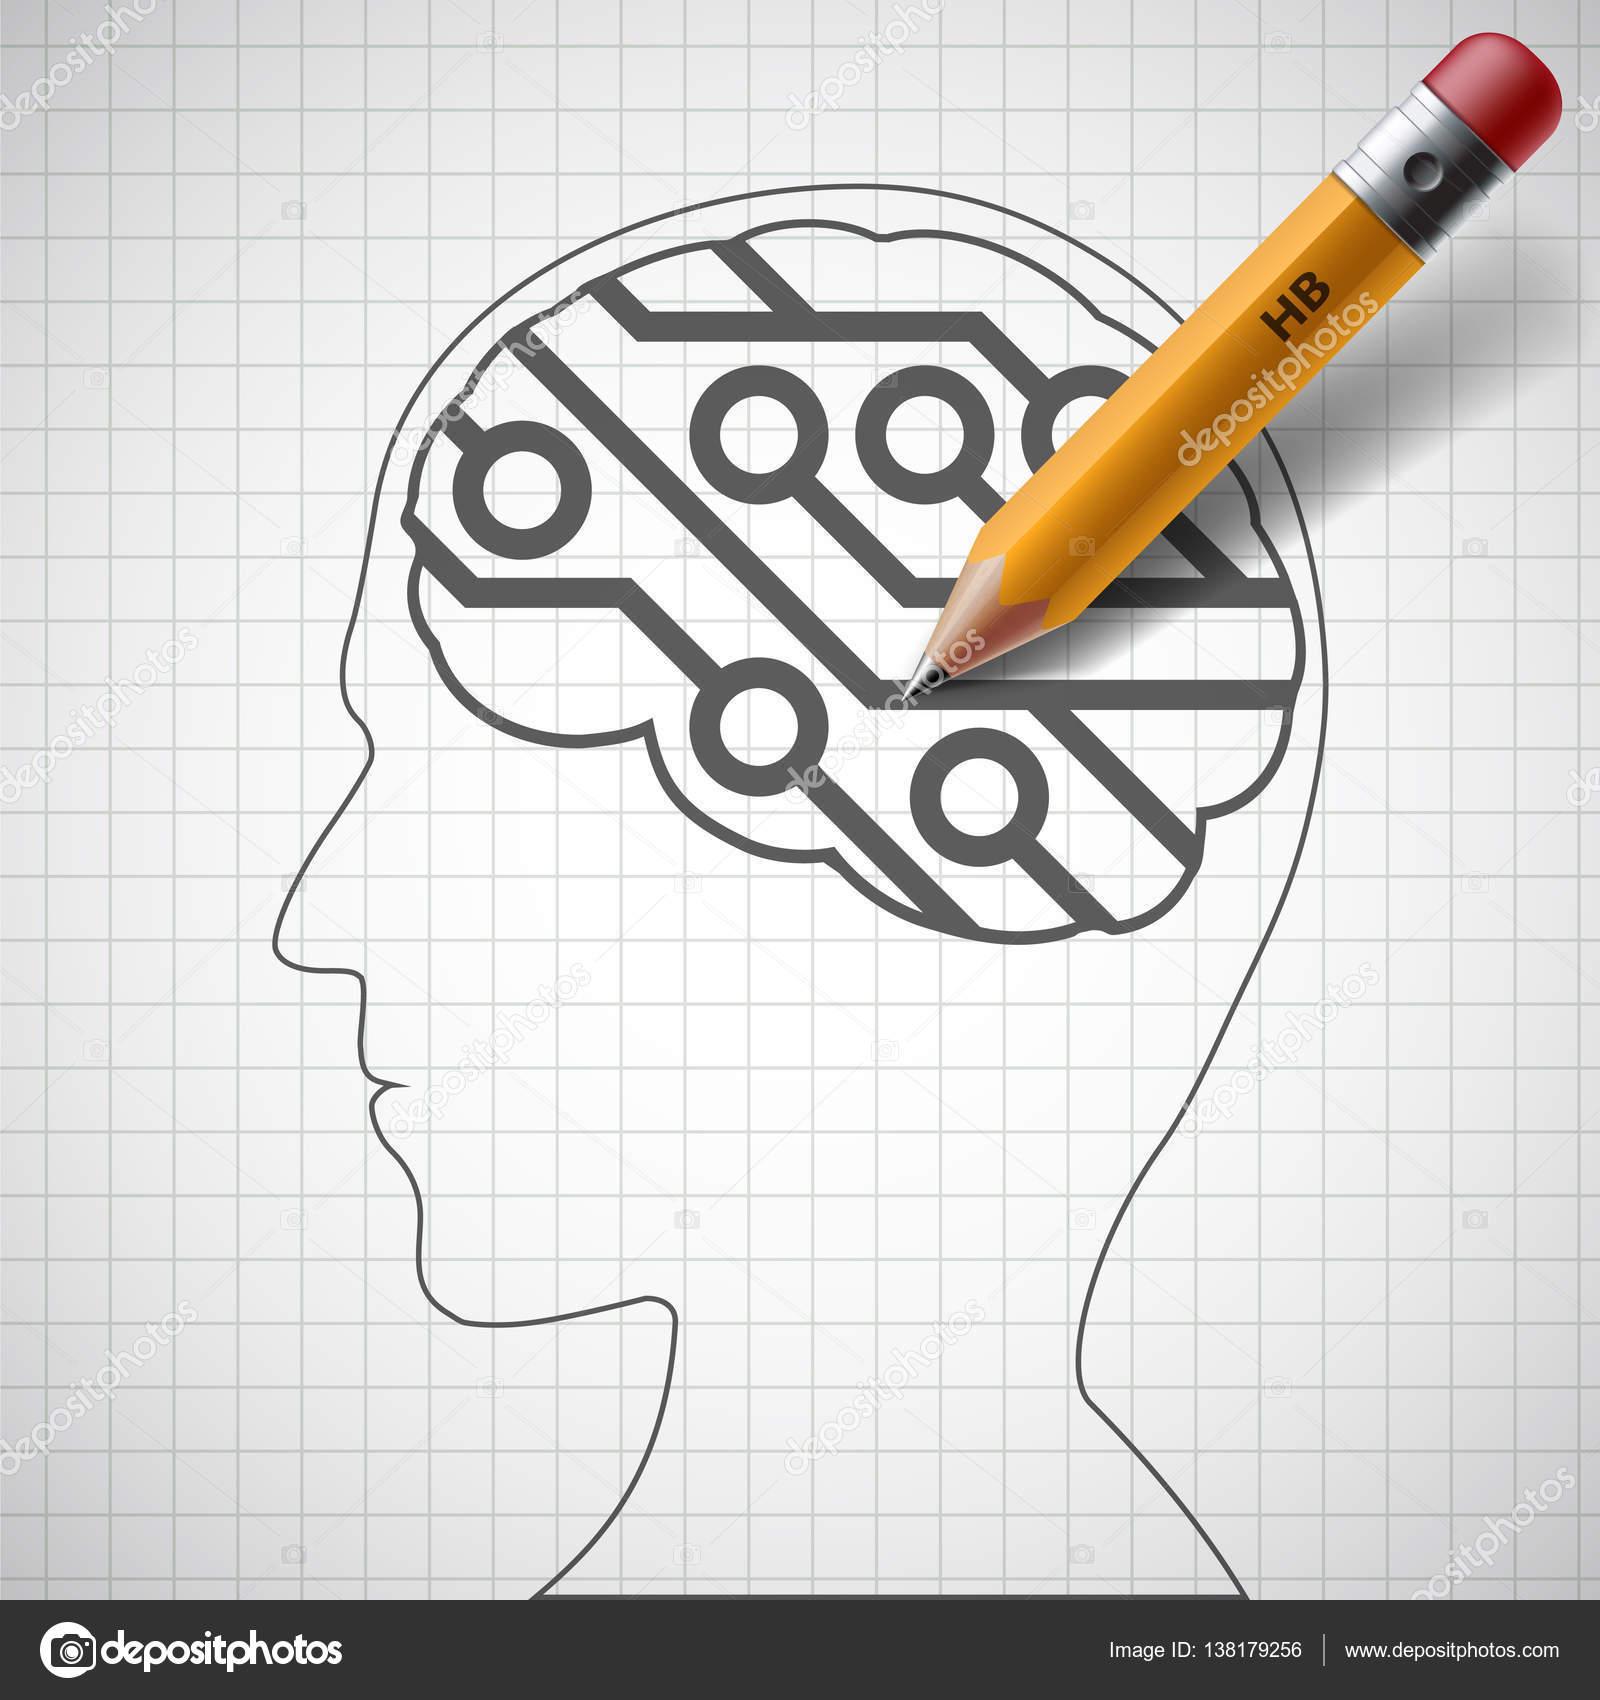 Pencil Drawing In Human Head A Electronic Circuit Stock Photo Draw Circuits